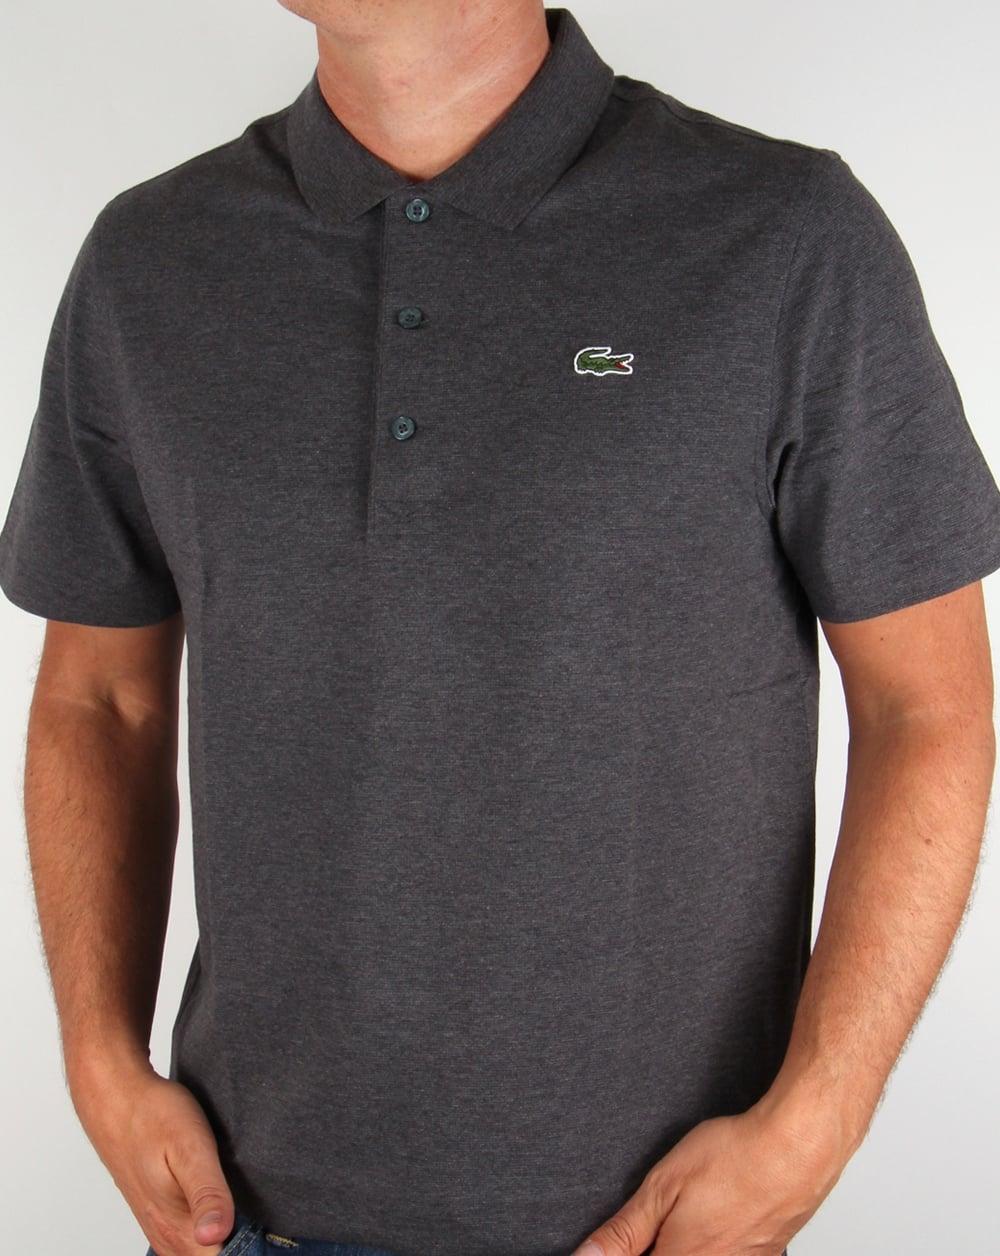 71ea43224 Lacoste Lacoste Polo Shirt Dark Grey